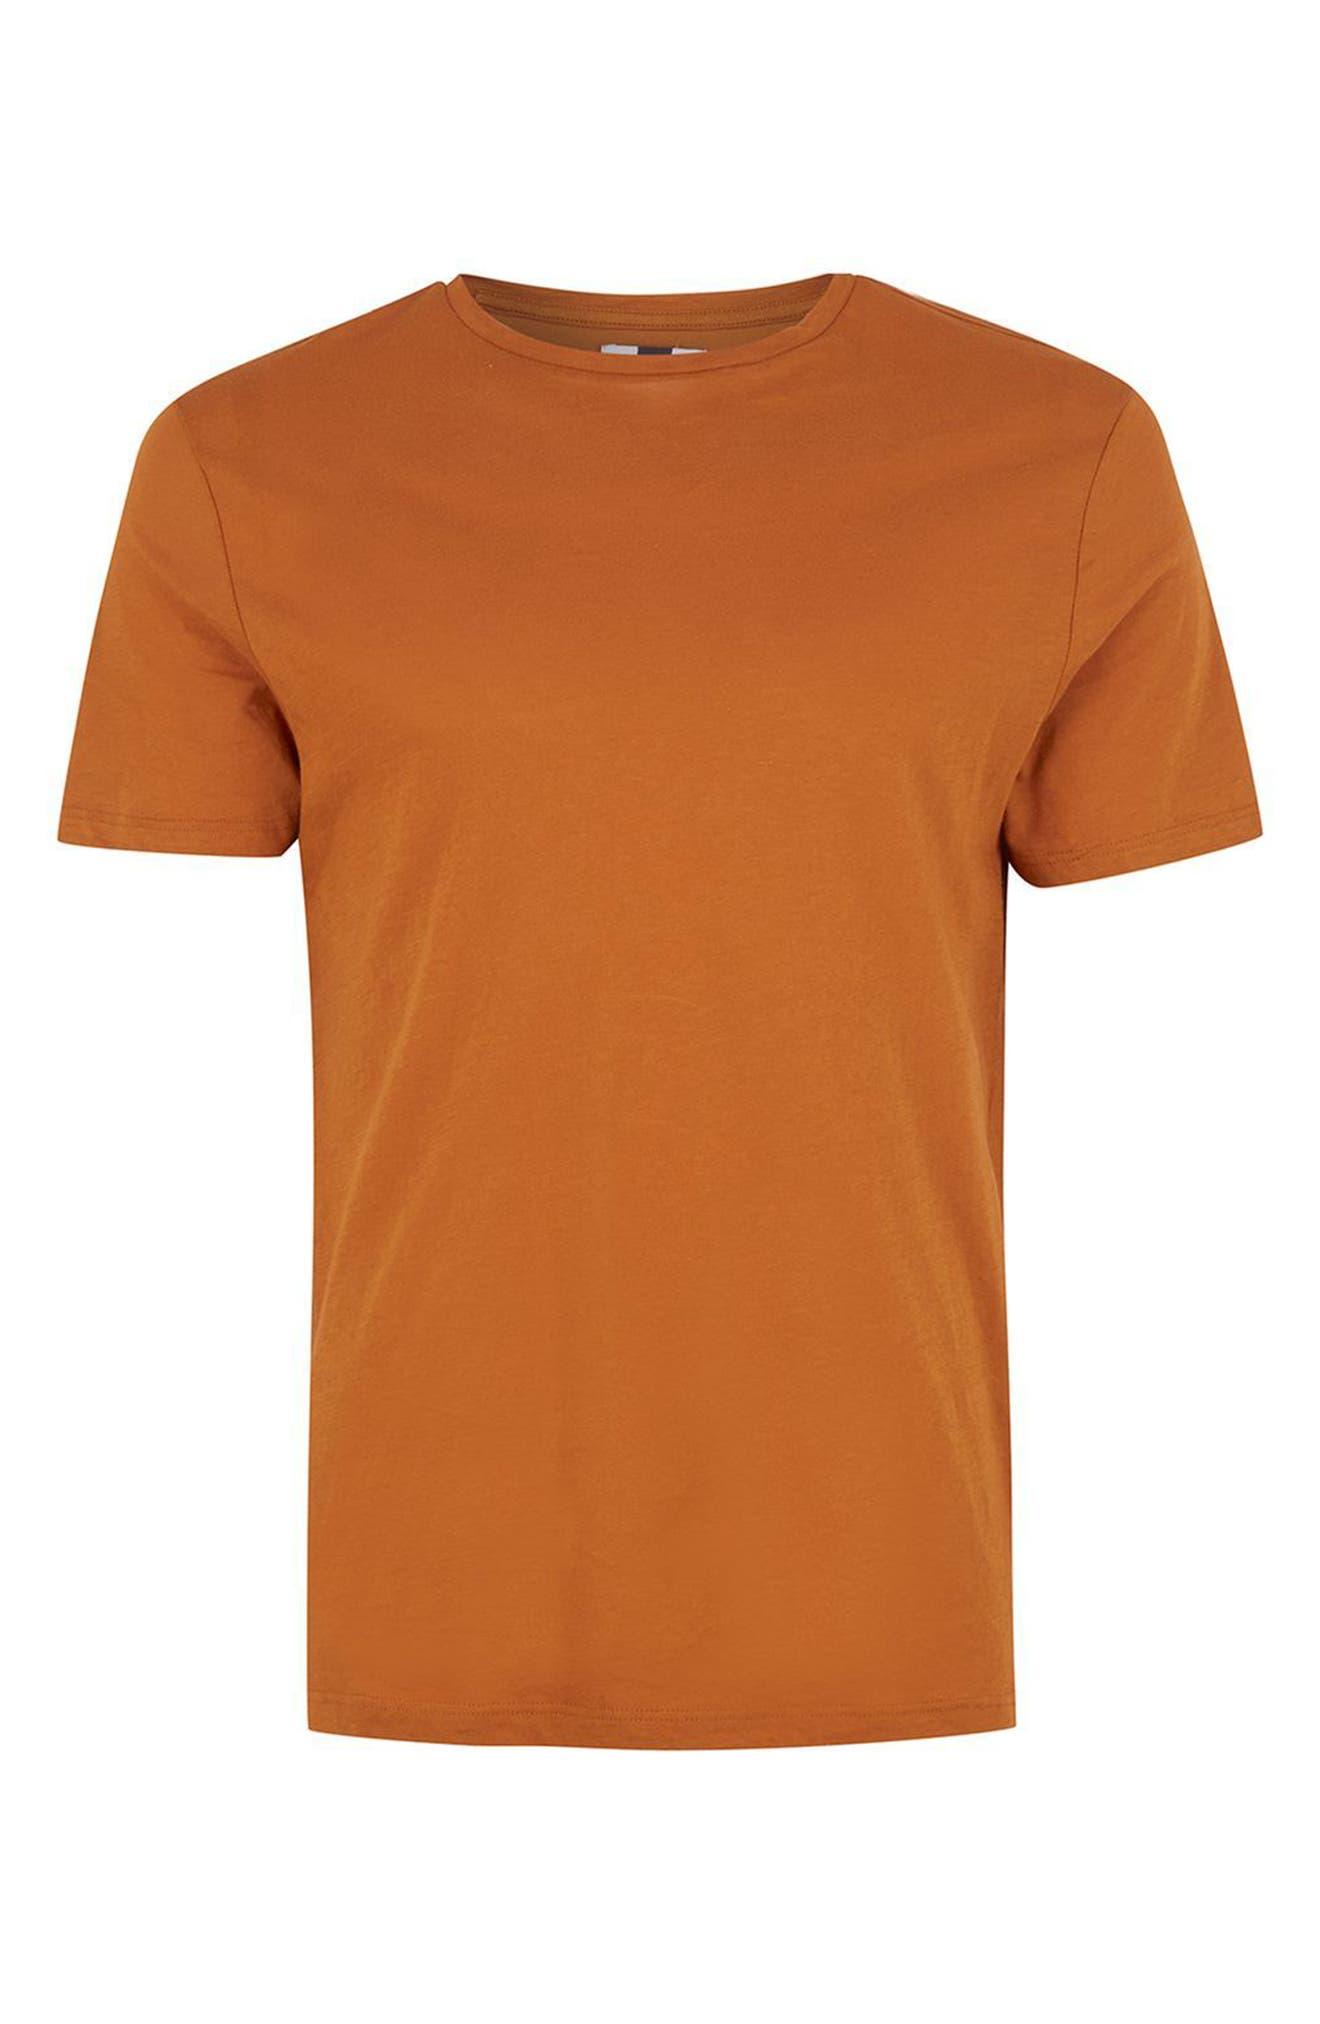 Crewneck T-Shirt,                             Alternate thumbnail 4, color,                             220